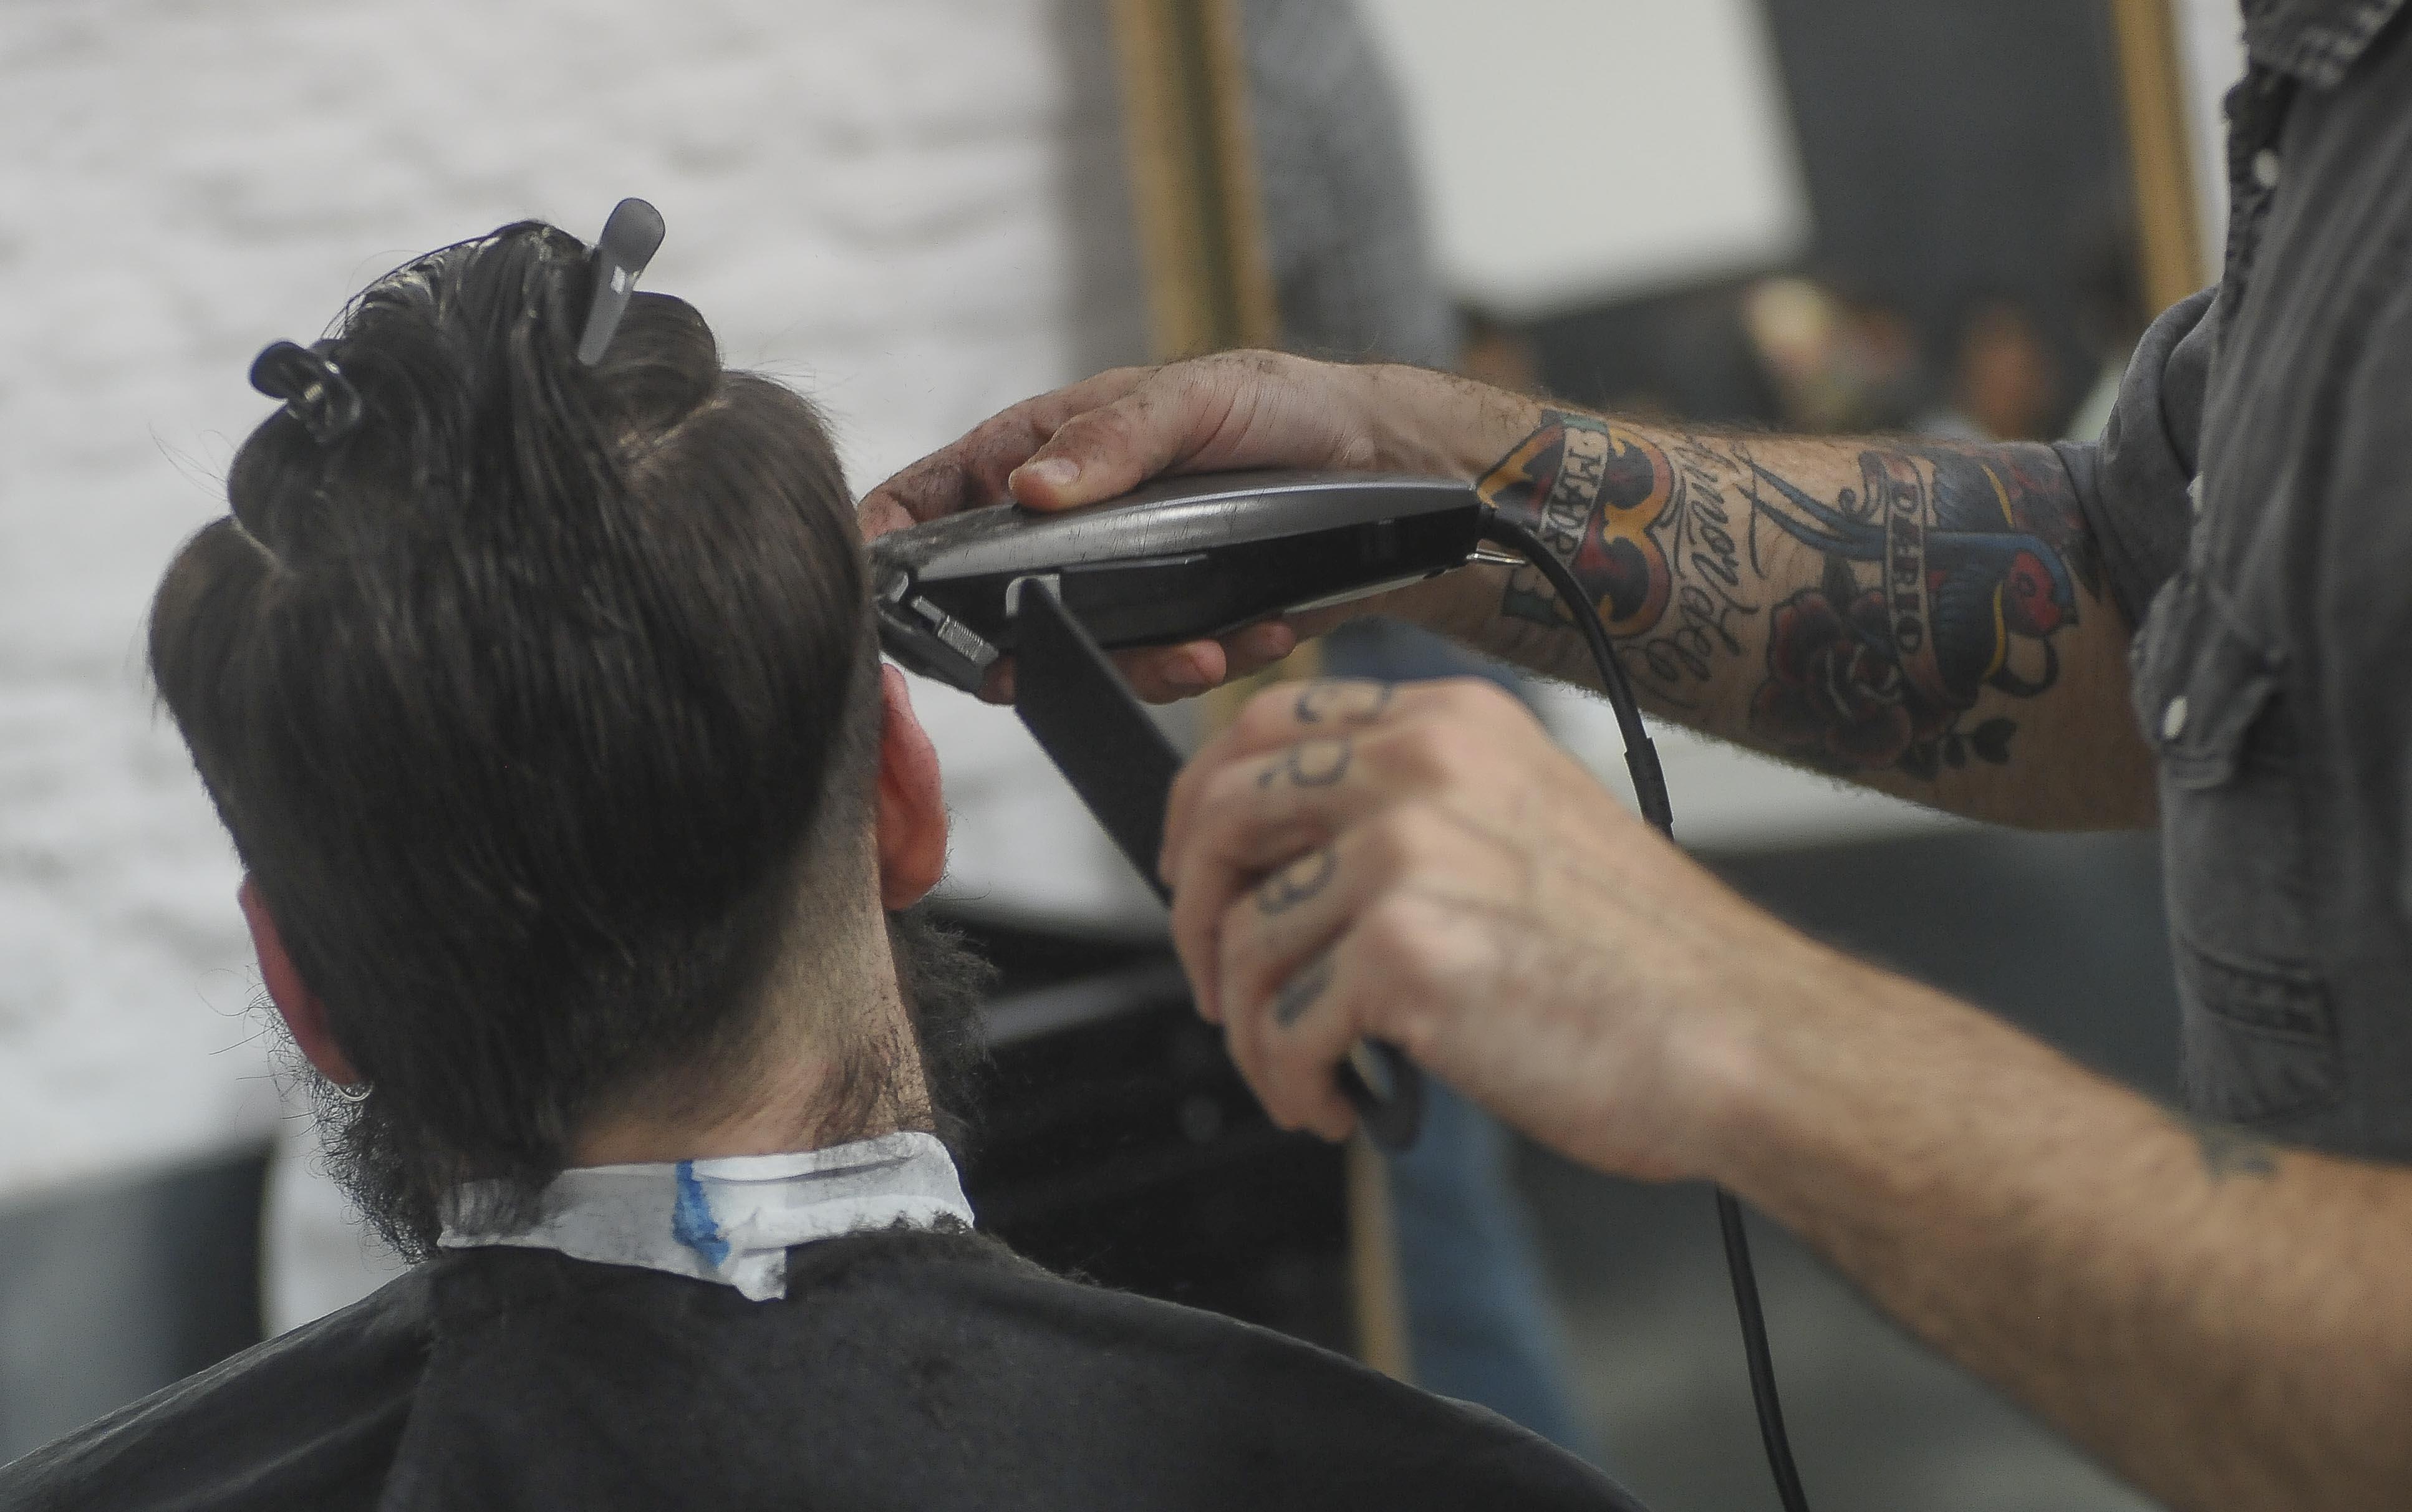 alvaro the barber